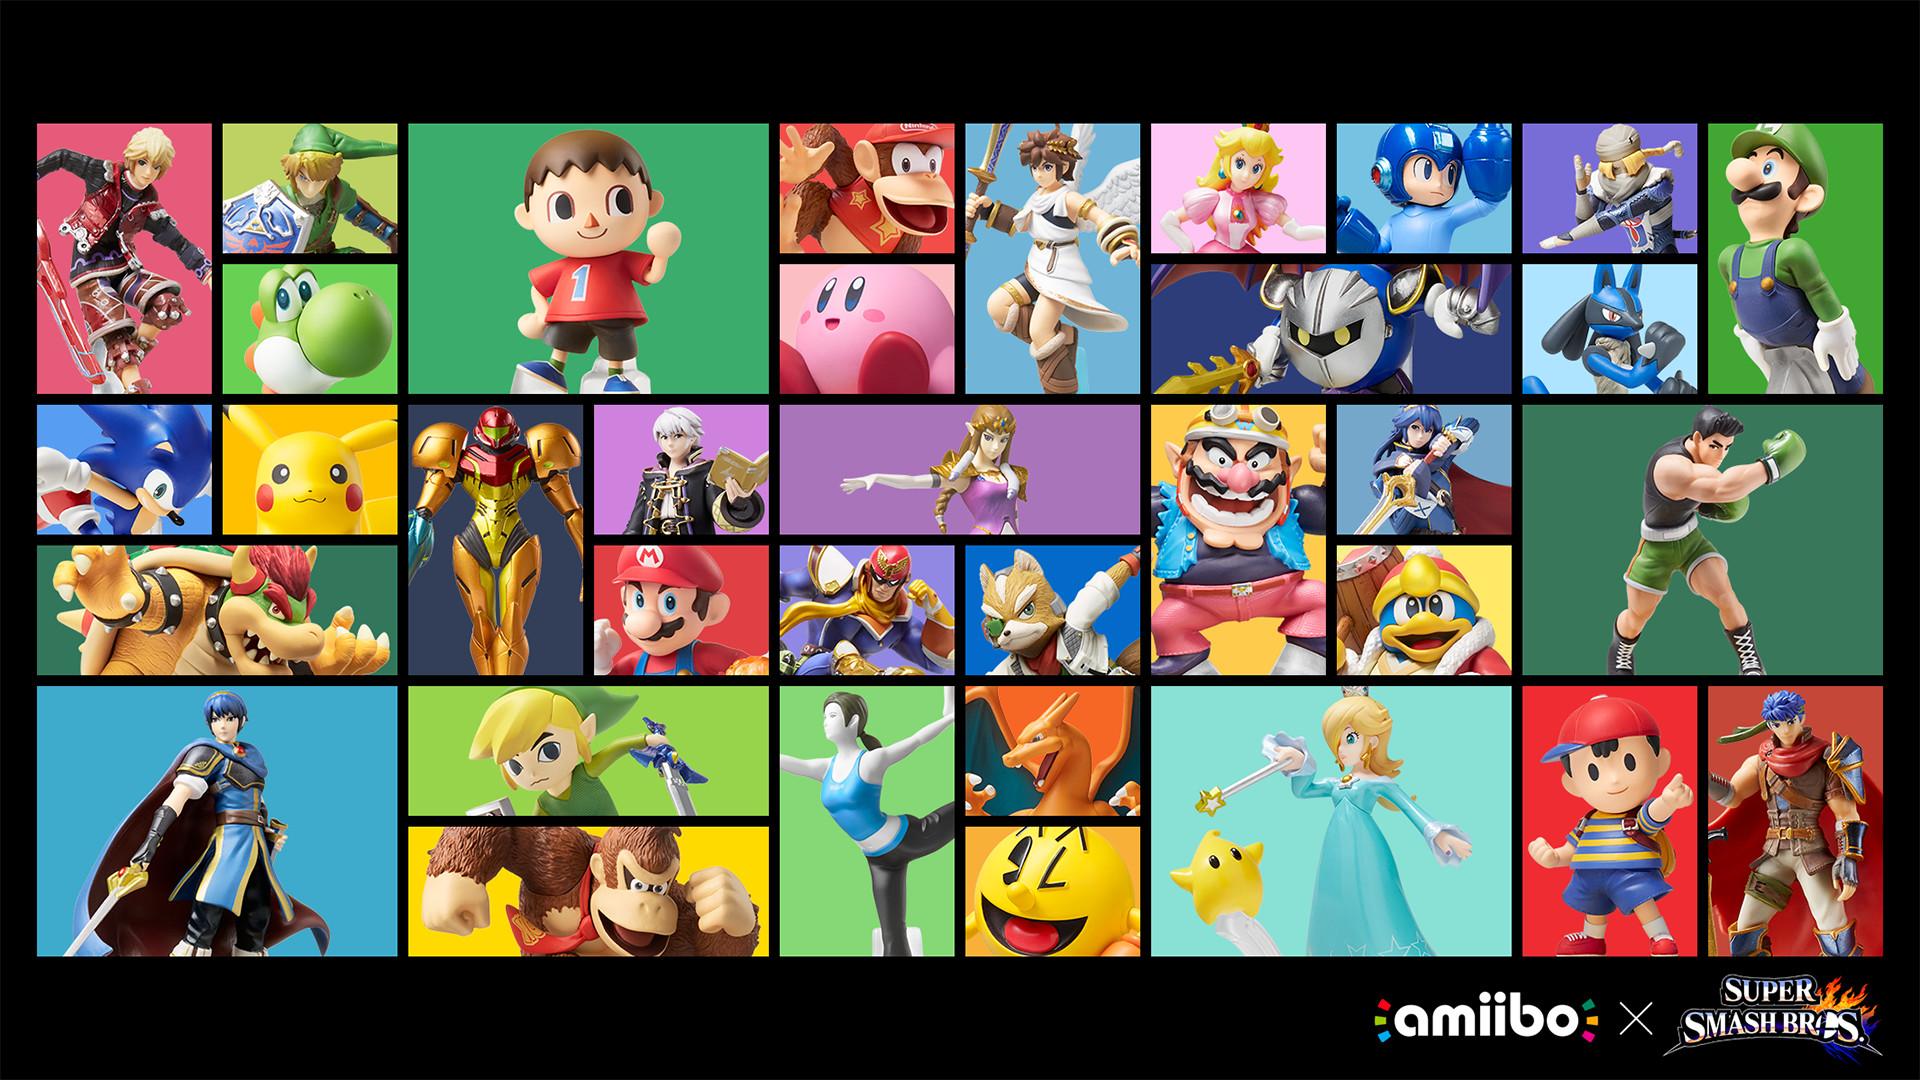 Super Smash Bros. x amiibo wallpaper